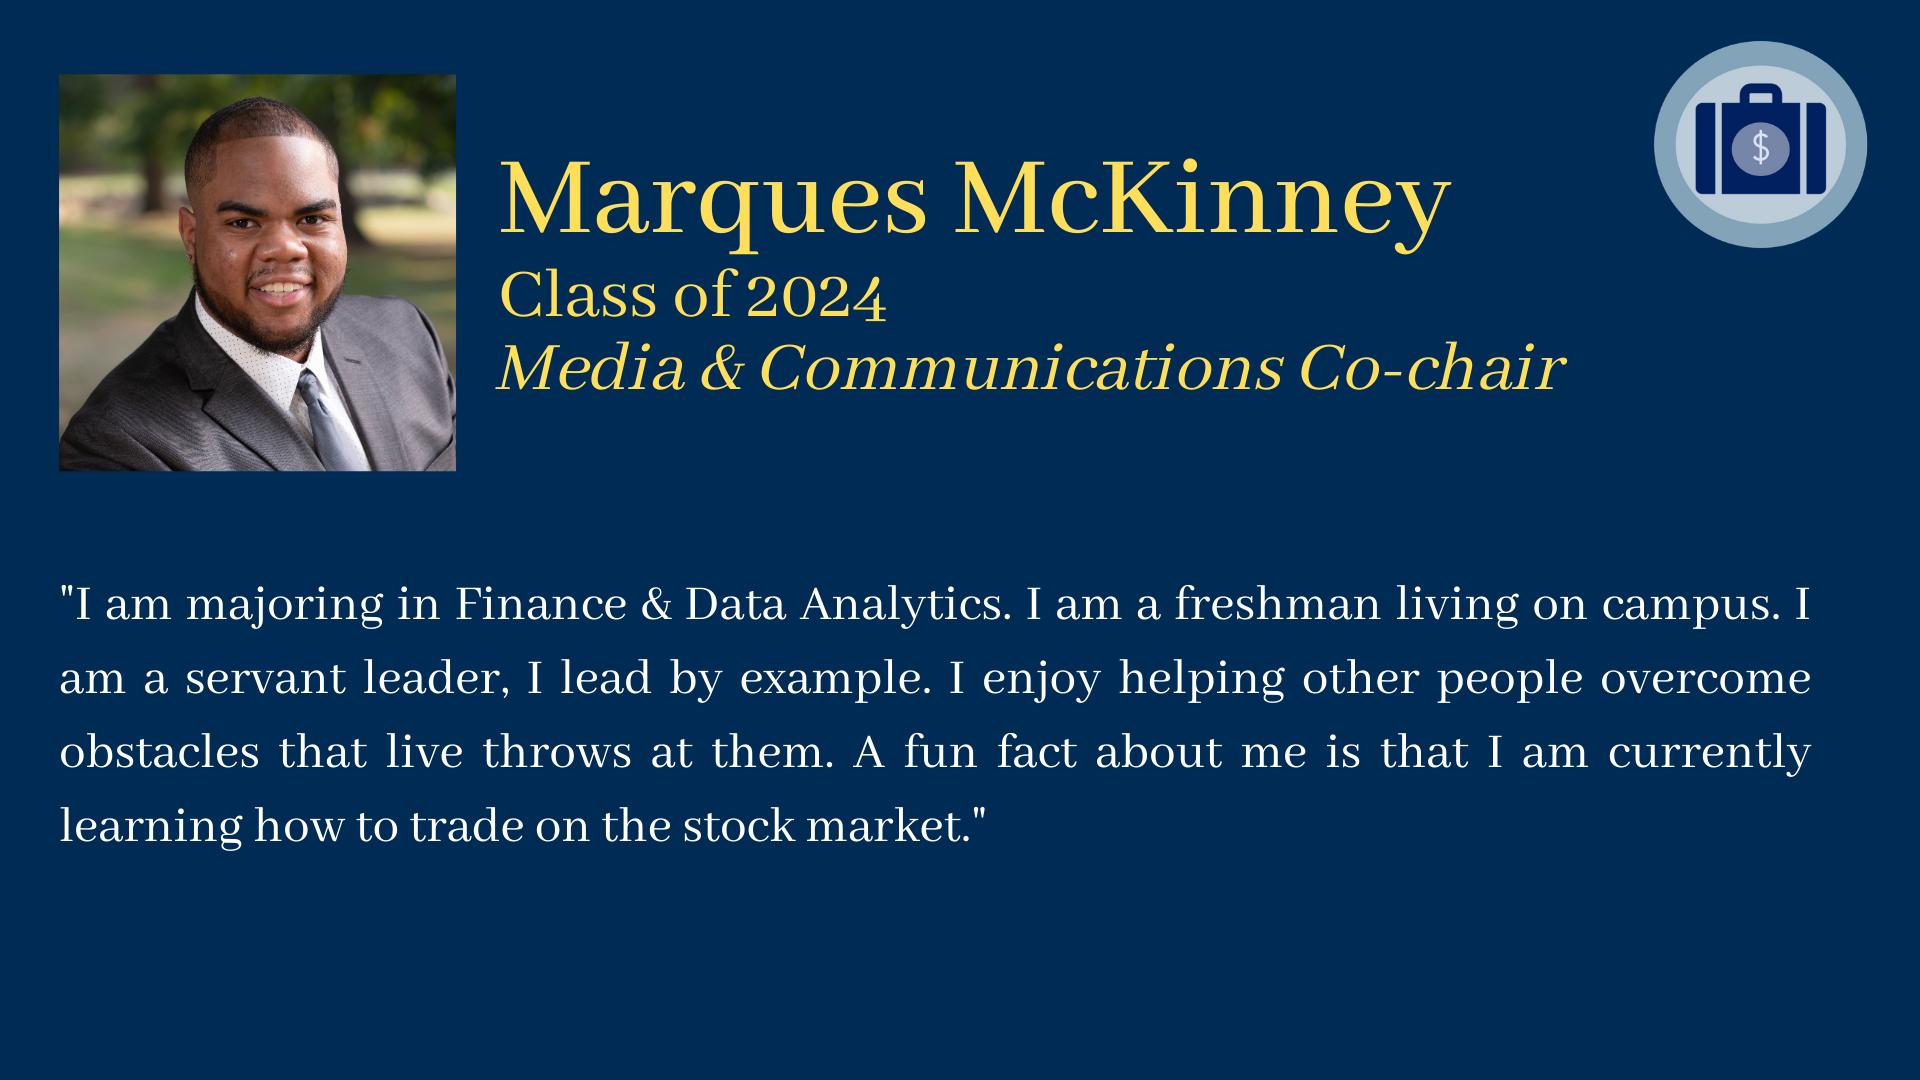 Marques McKinney bio